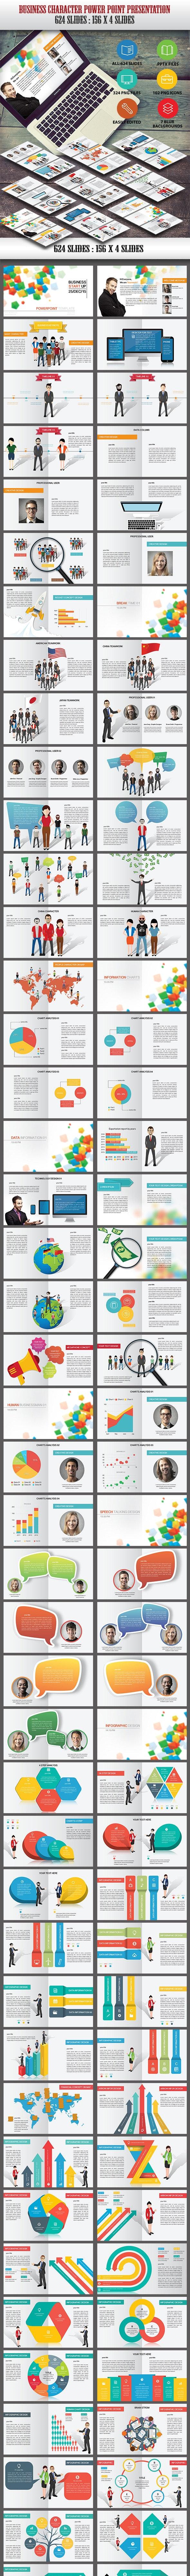 Business Powerpoint Presentation - Business PowerPoint Templates